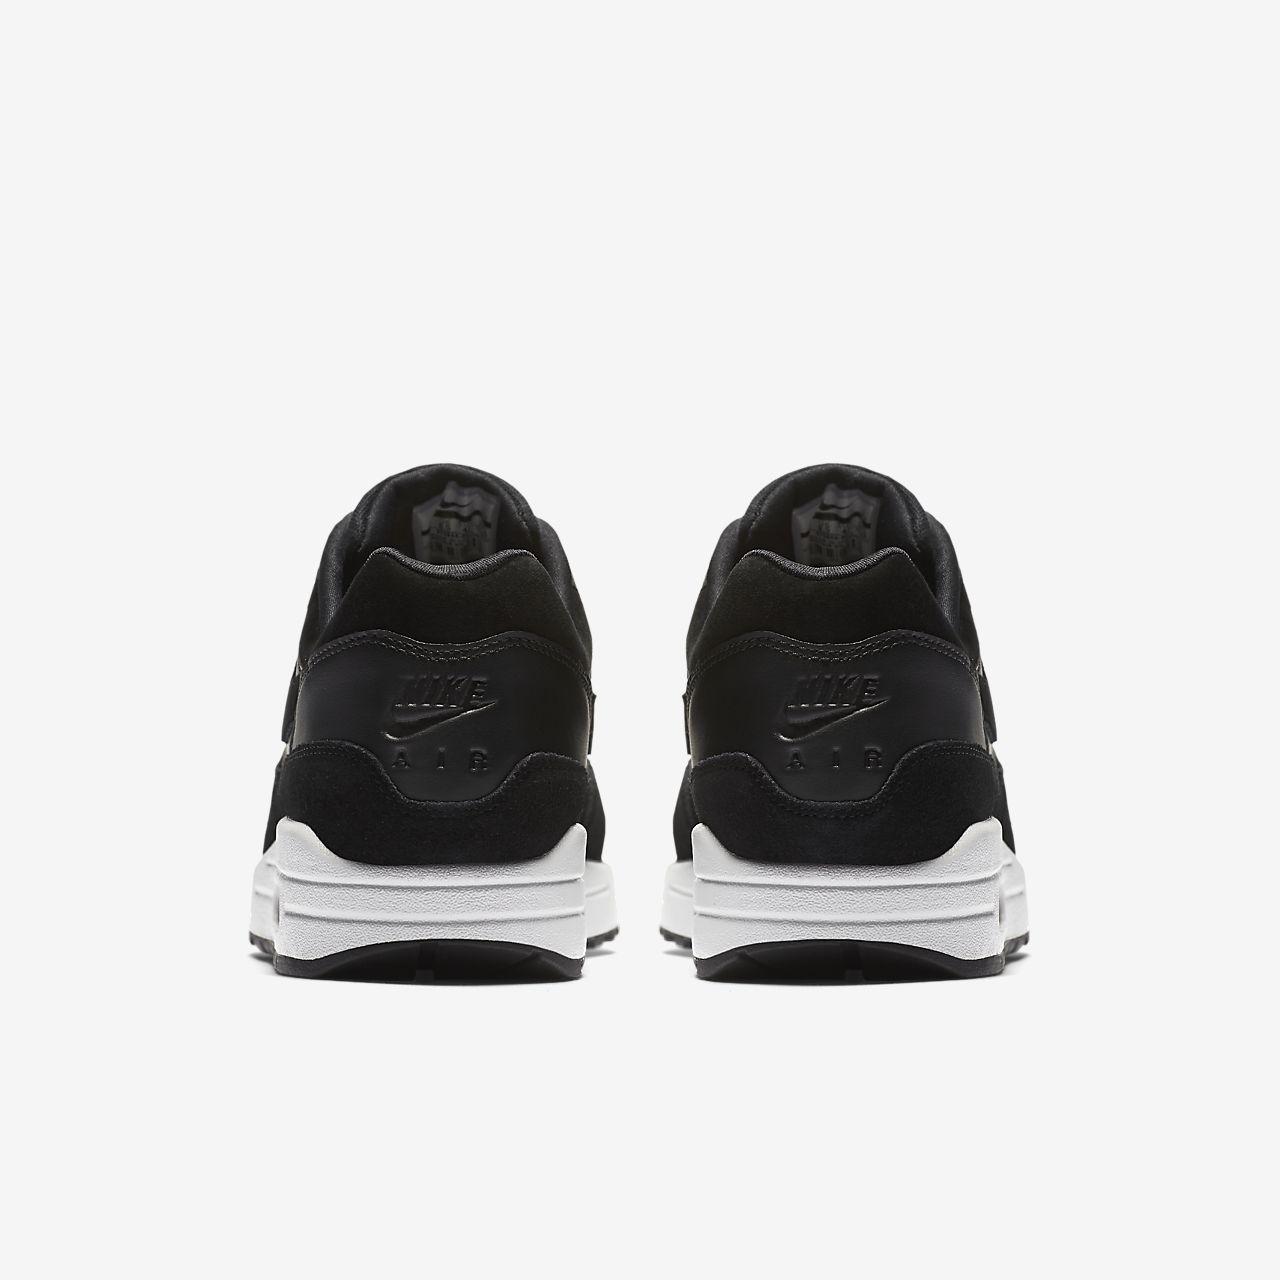 nike air max shoes white and black. nike air max 1 premium men\u0027s shoe shoes white and black